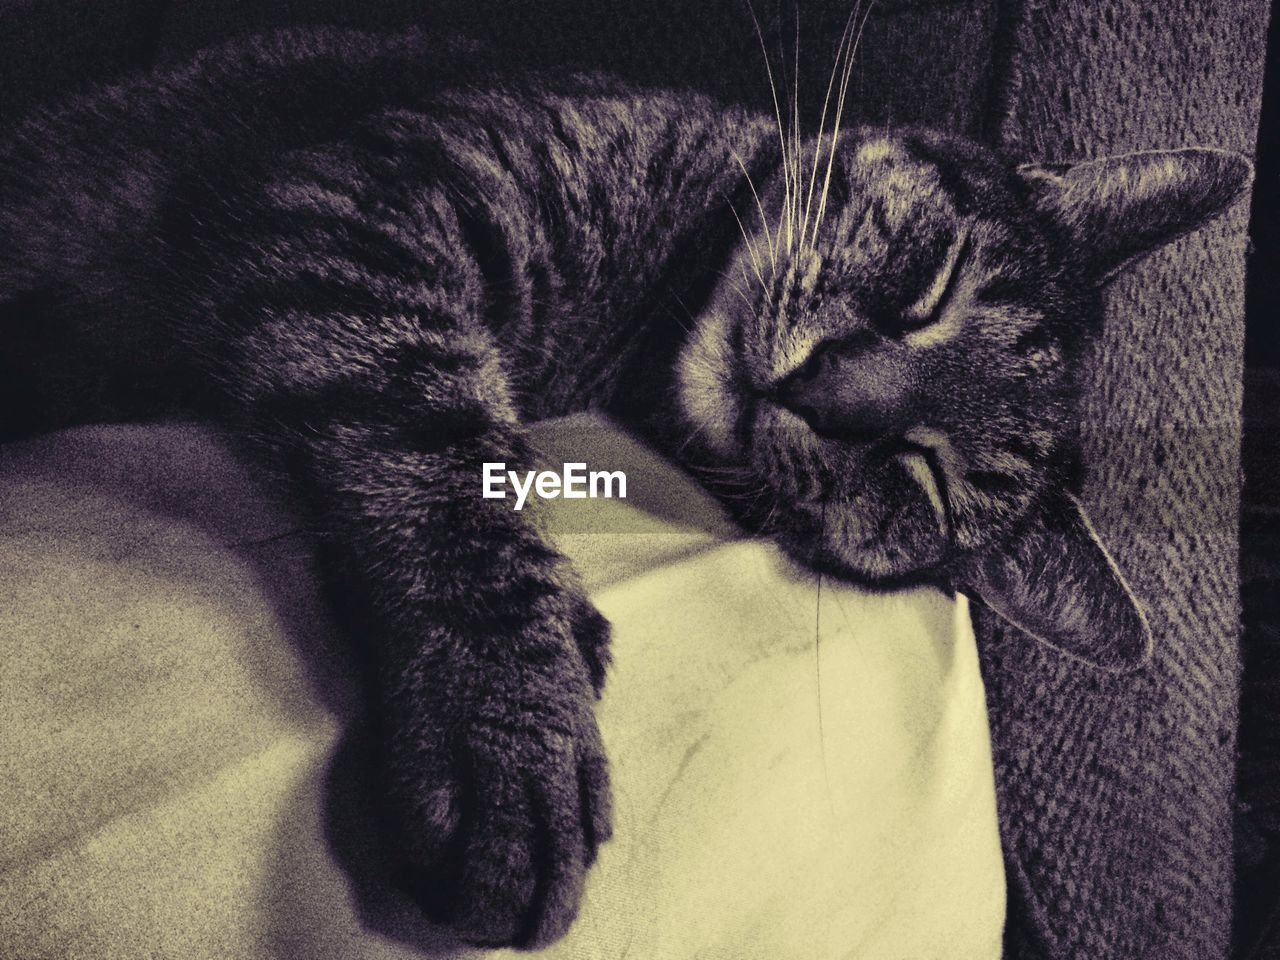 Close-Up Of Tabby Sleeping On Sofa